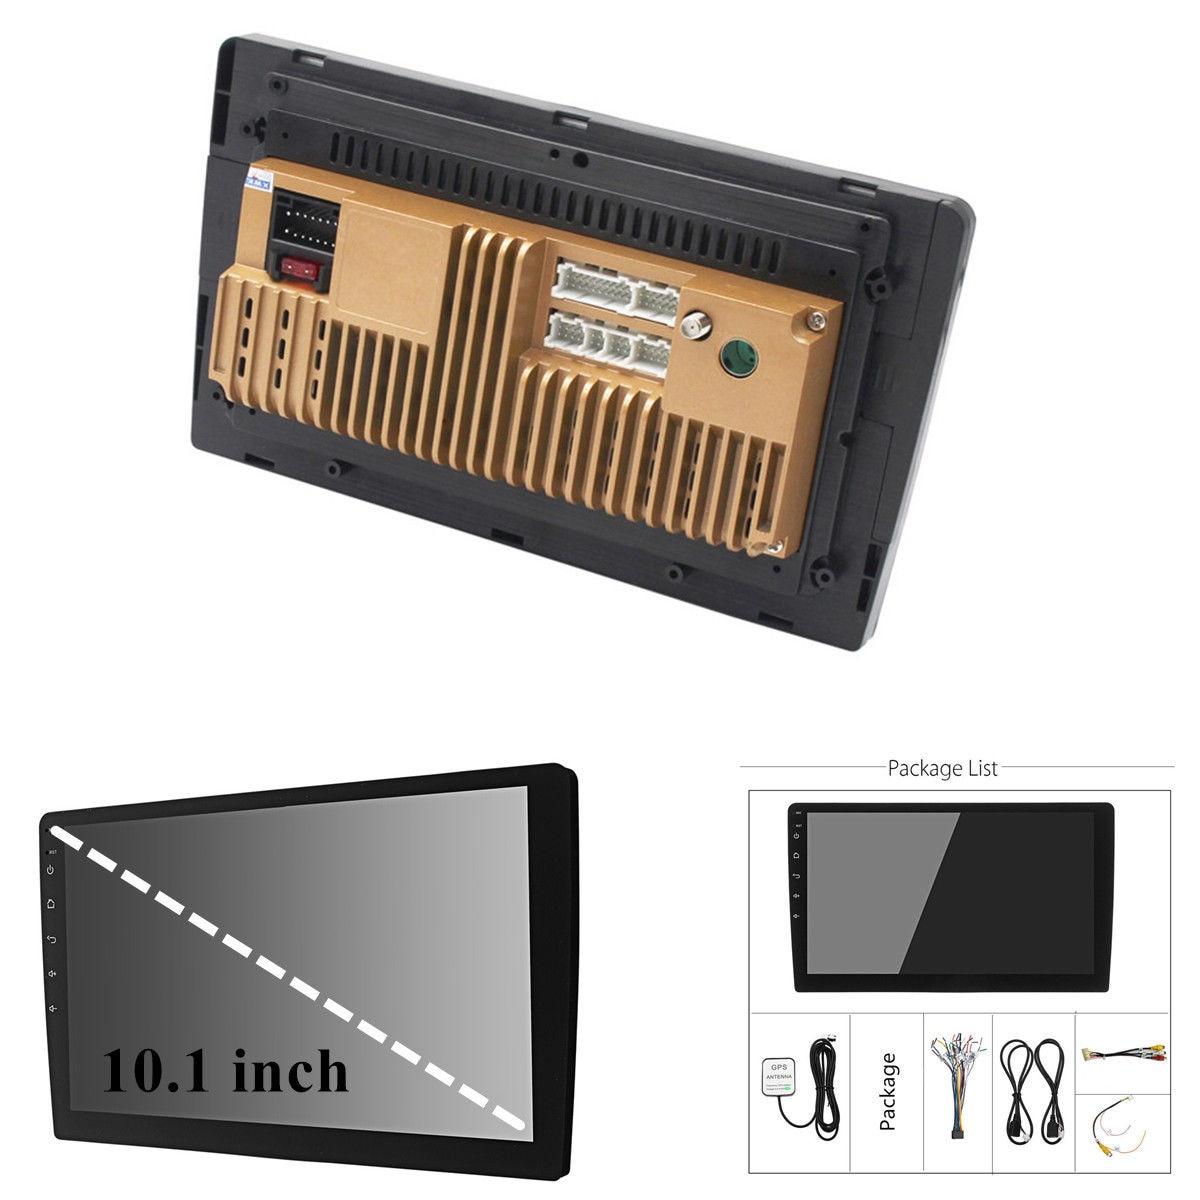 HTB1akJqXsTxK1Rjy0Fgq6yovpXaN - 車マルチメディアプレーヤー10.1 ''アンドロイド8.1カーステレオ2DIN Bluetooth WIFI GPSナビクアッドコアラジオビデオMP5プレーヤー